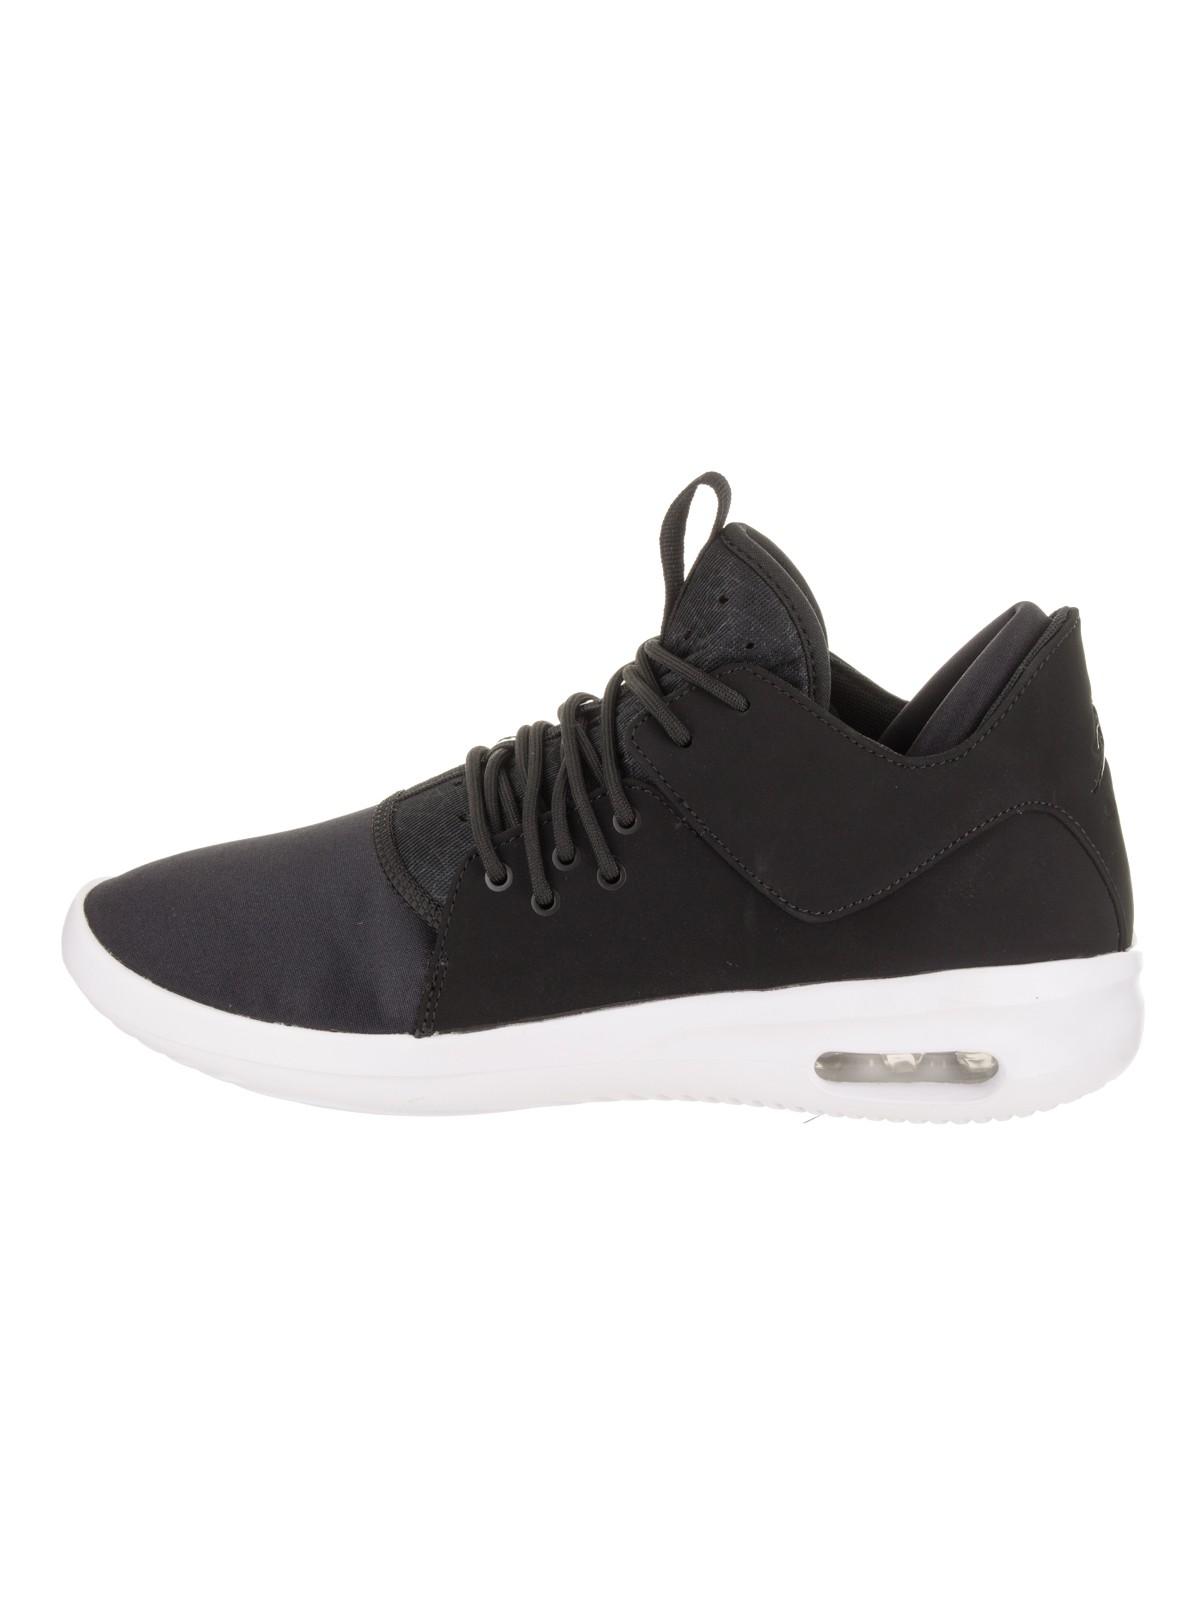 Nike Jordan Men's Air Jordan First Class Casual Shoe